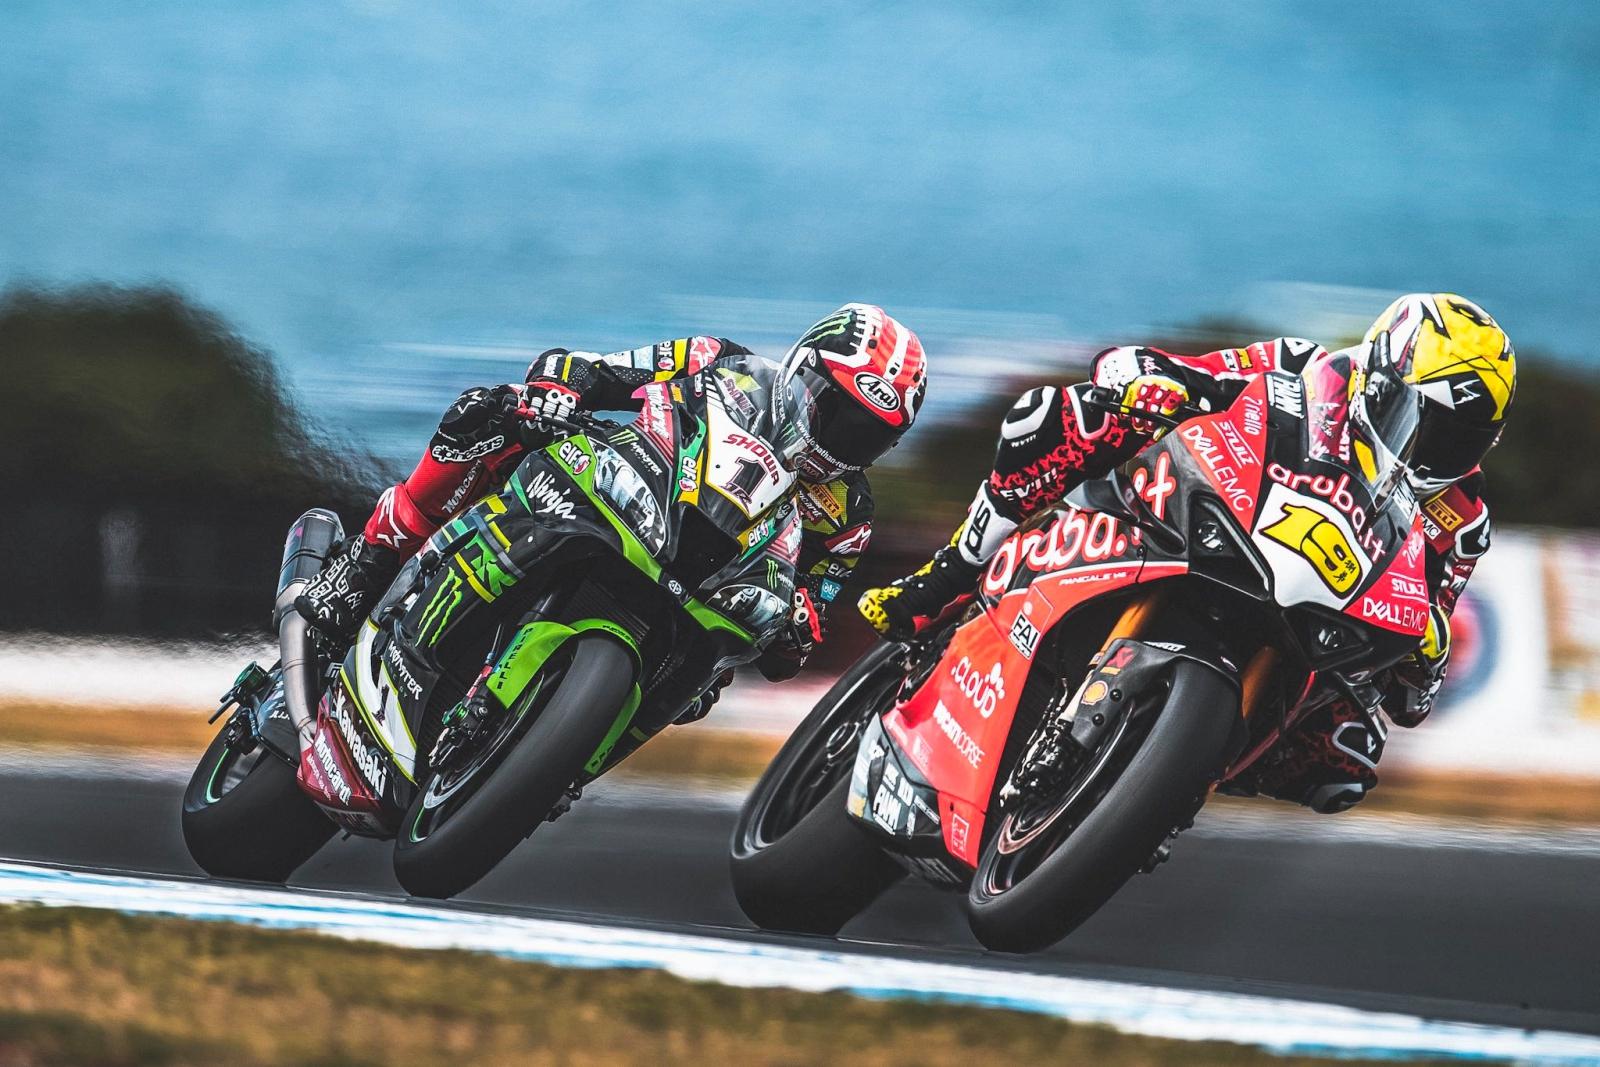 Superbike 2019: pilotos, motos, calendario, españoles y cinco favoritos